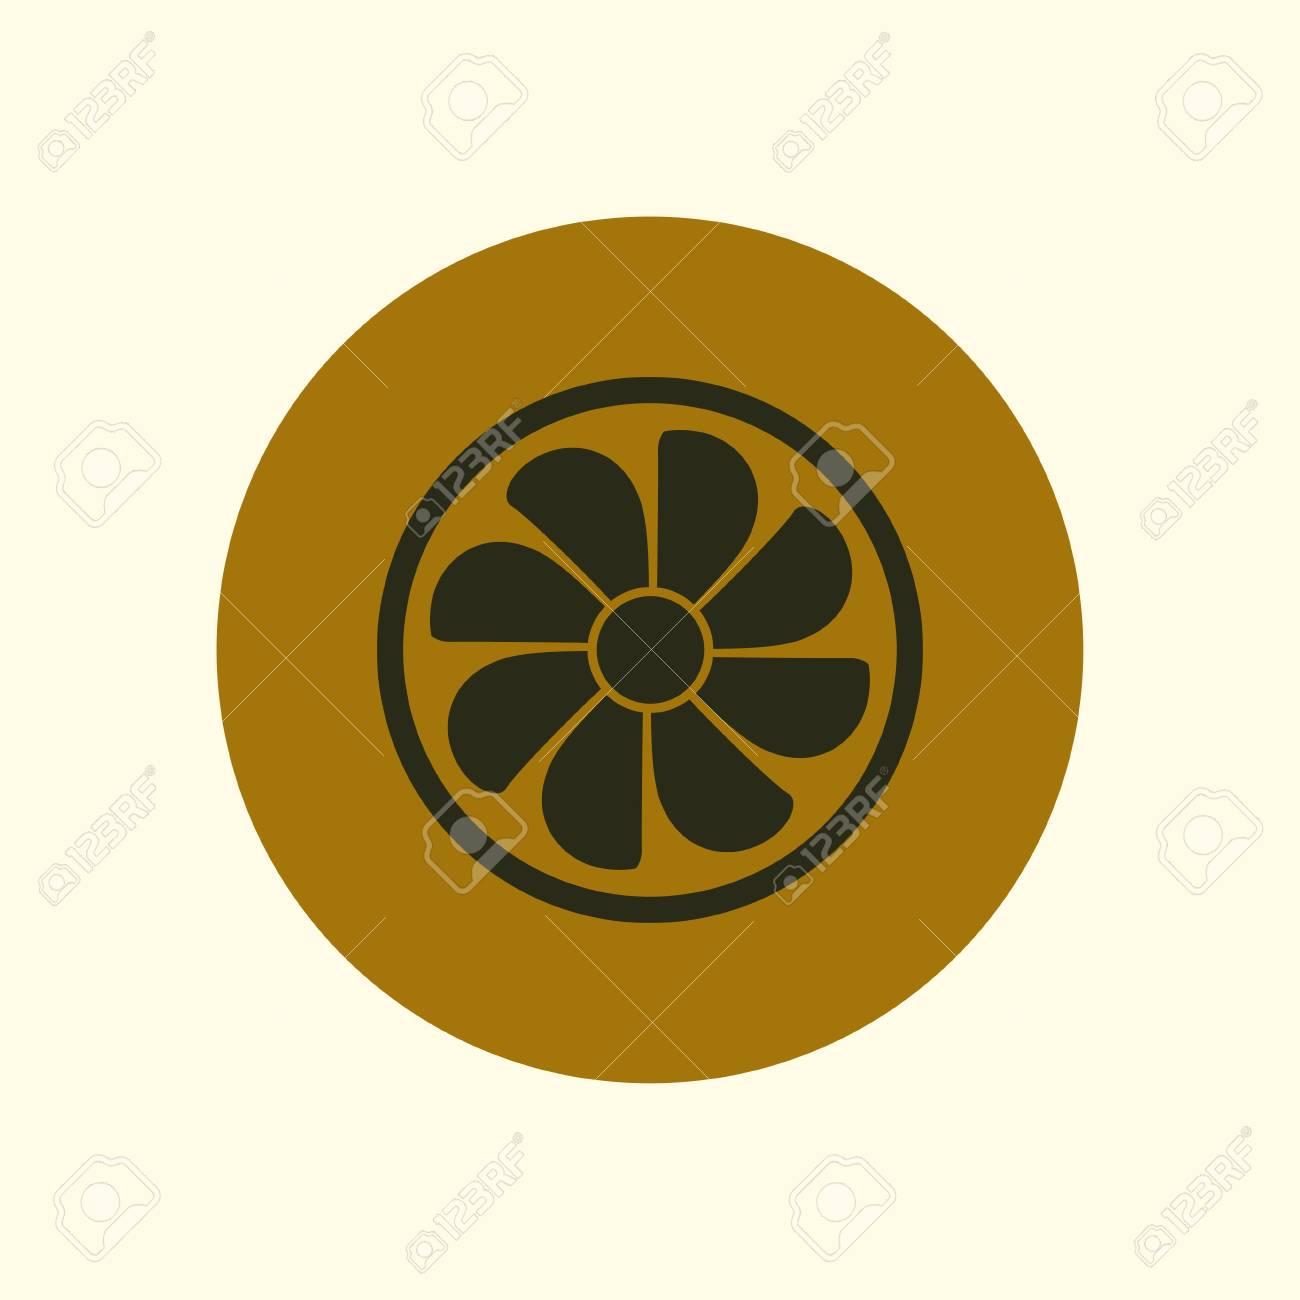 Exhaust Fan Icon Ventilator Symbol Flat Design Style Royalty Free